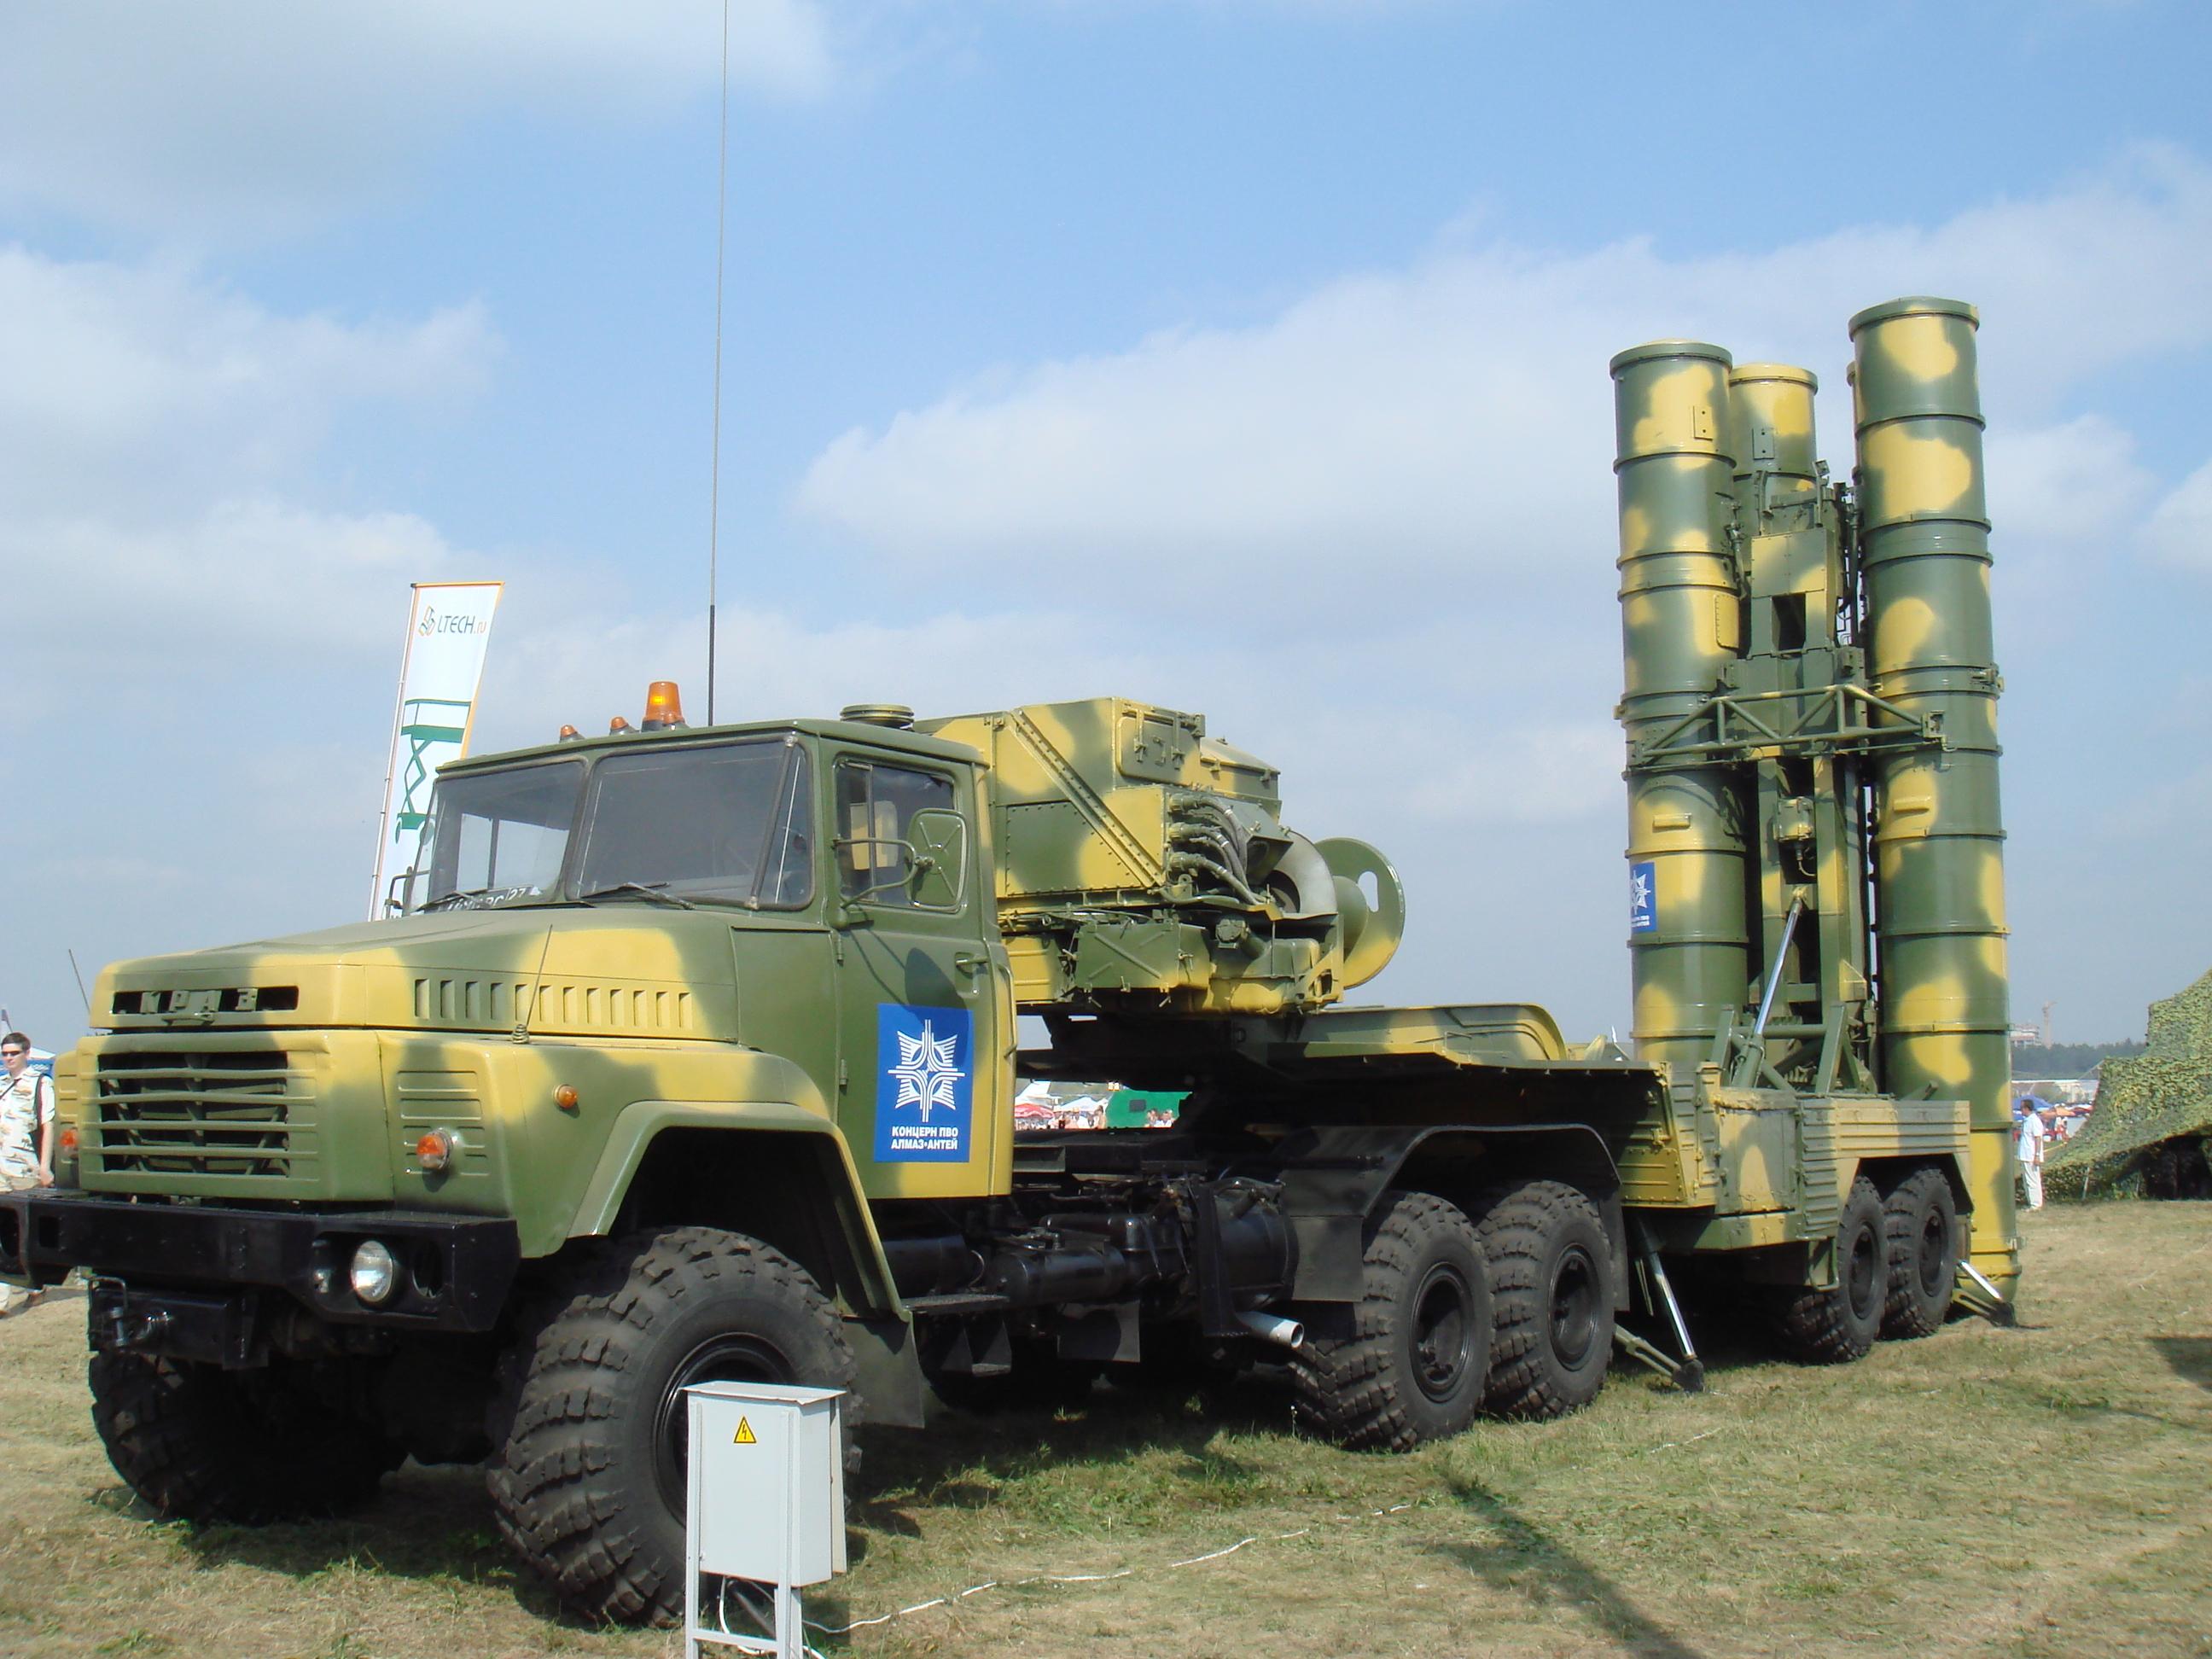 Venezuela compra mísseis russos